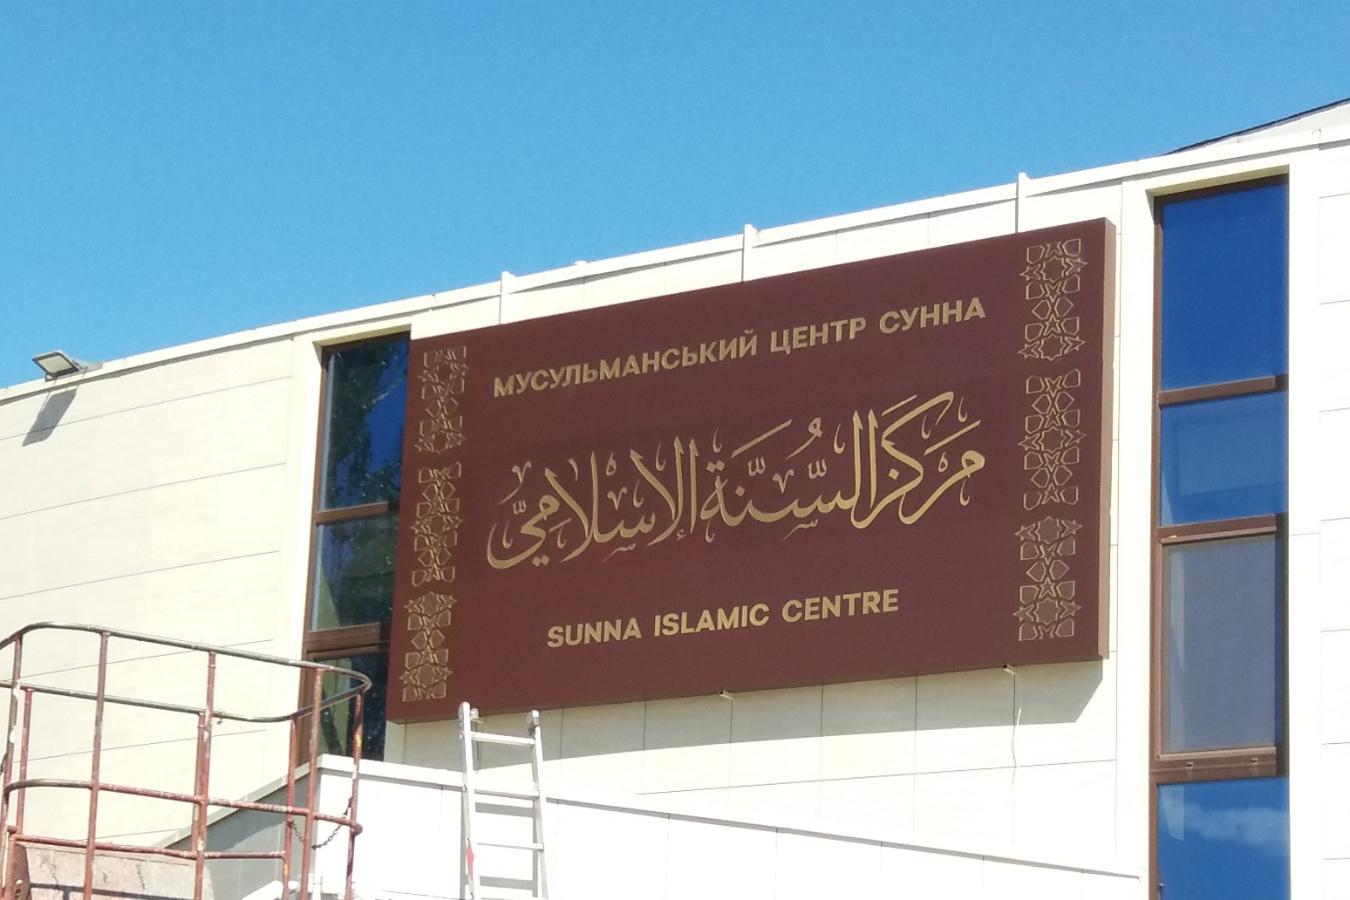 Вывсека для мусульманского центра Сунна